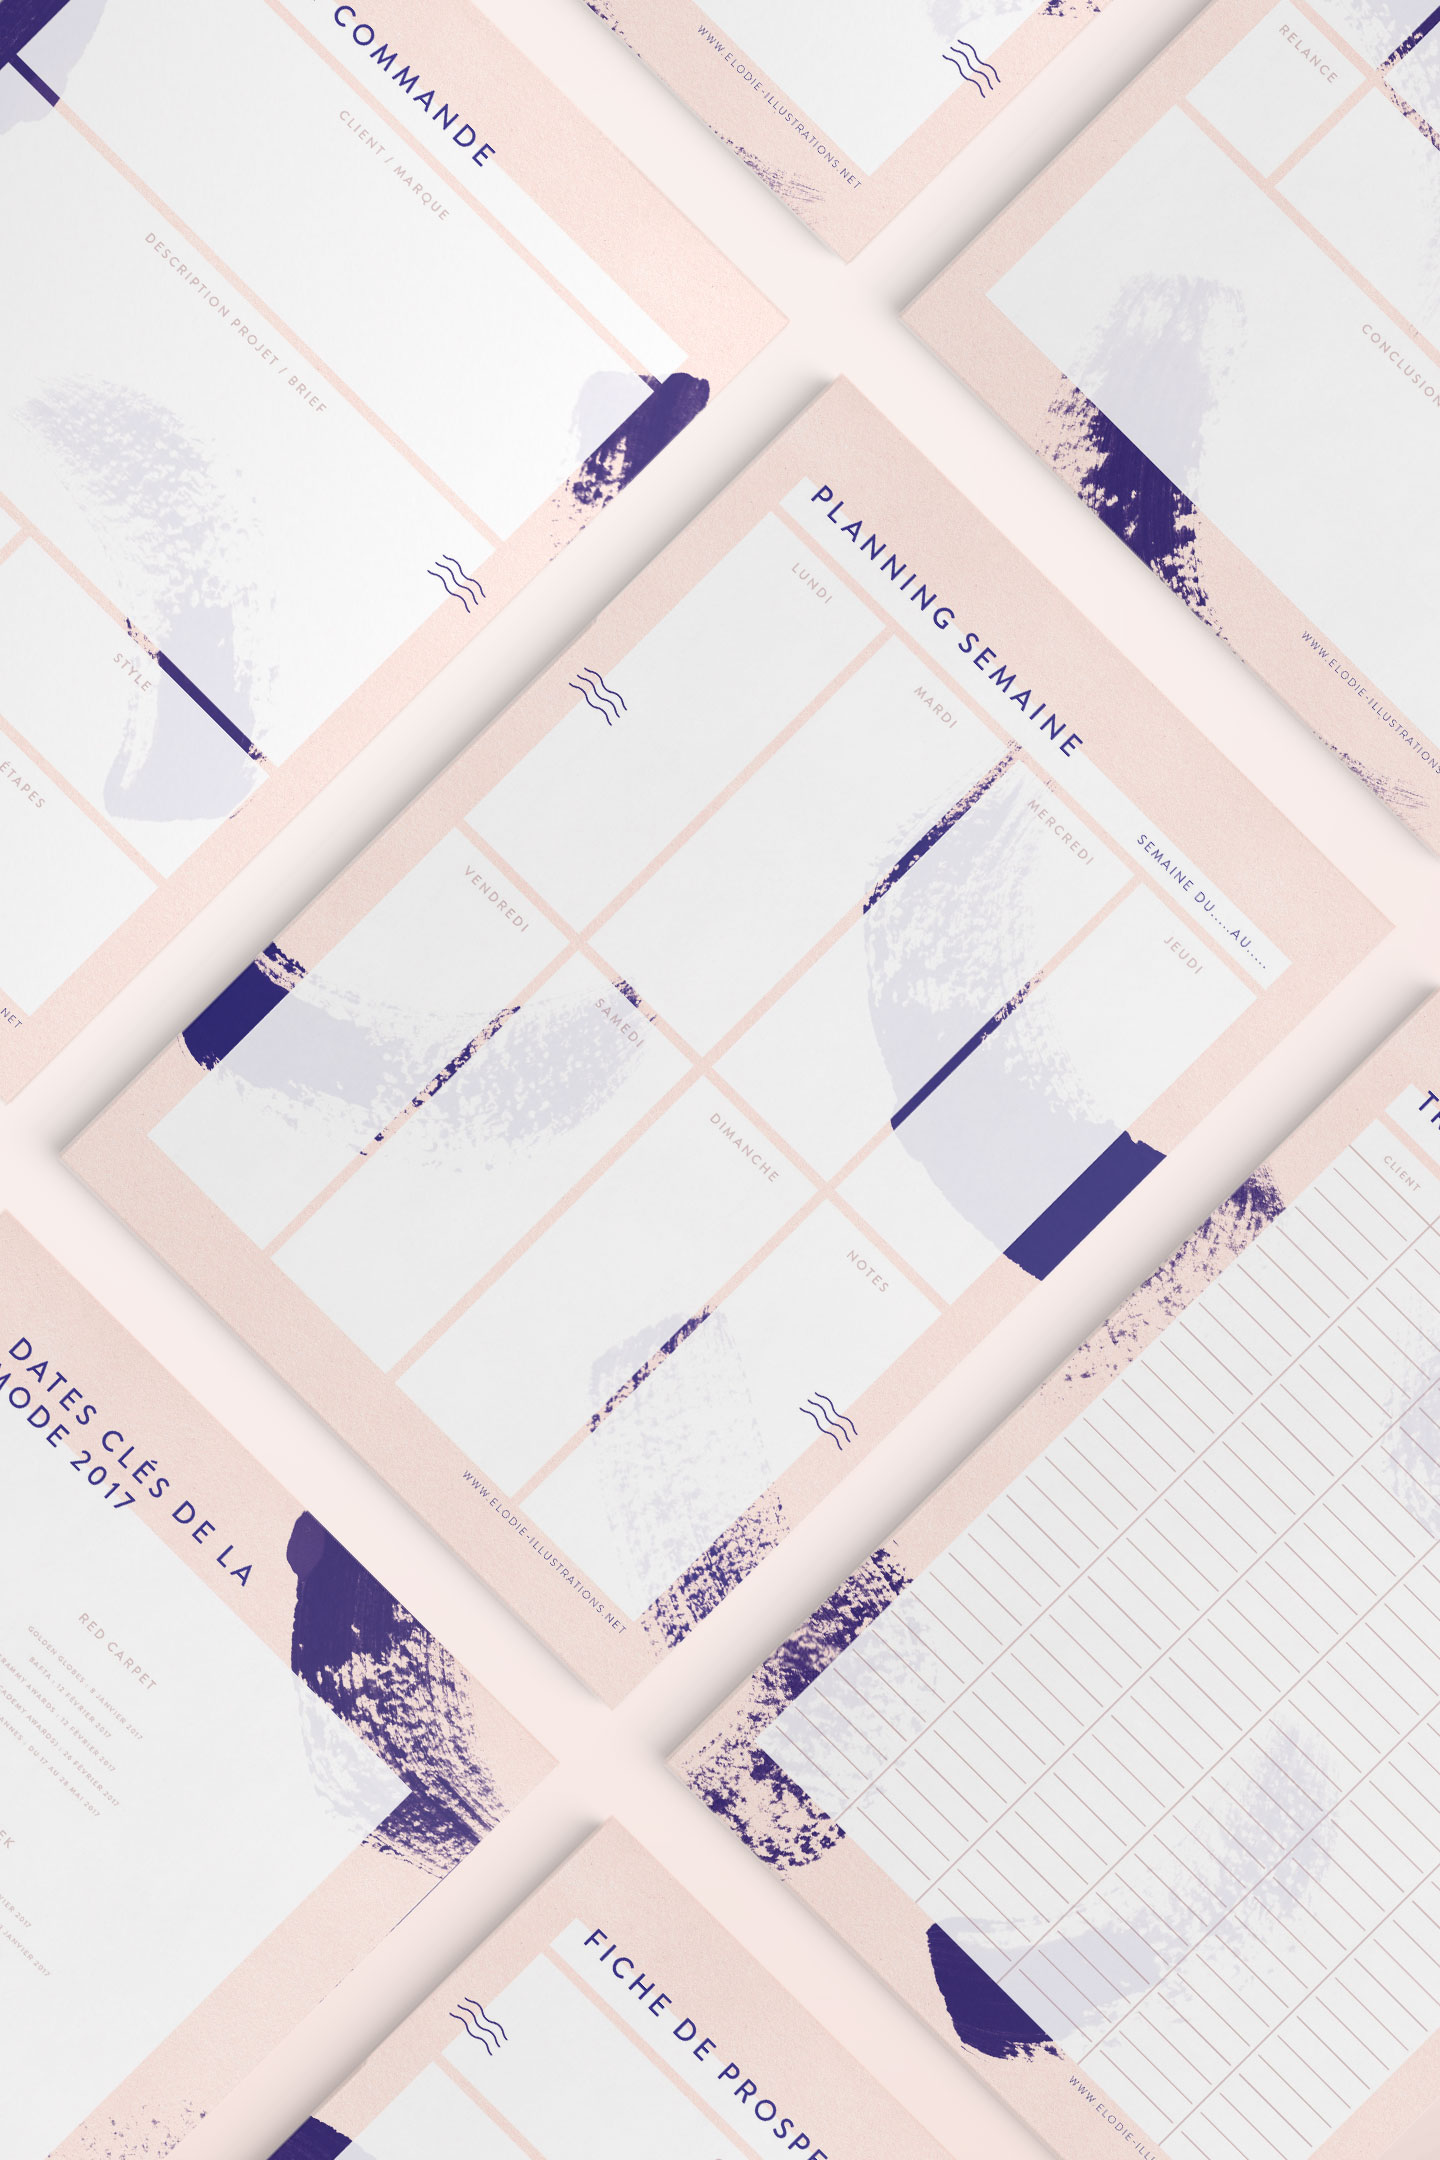 elodie-blog-kit-planning-illustratrice_flatlay